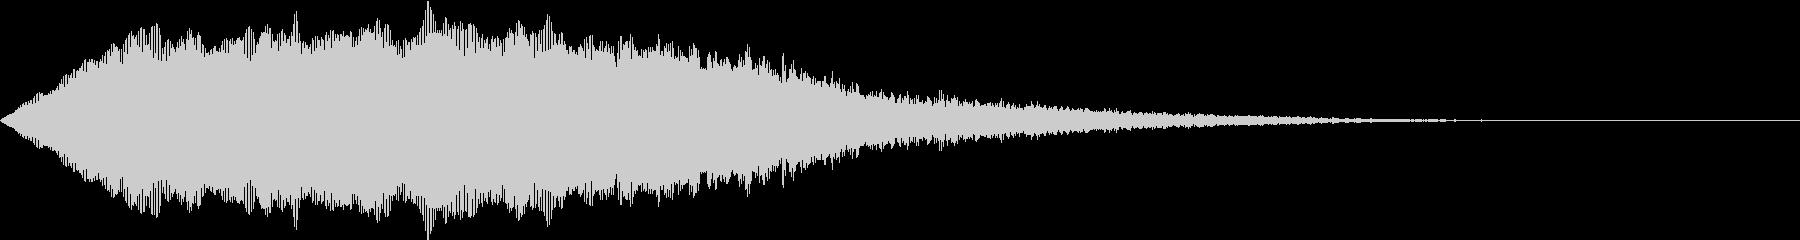 SFX ケミカルな昭和特撮風パッド 1の未再生の波形